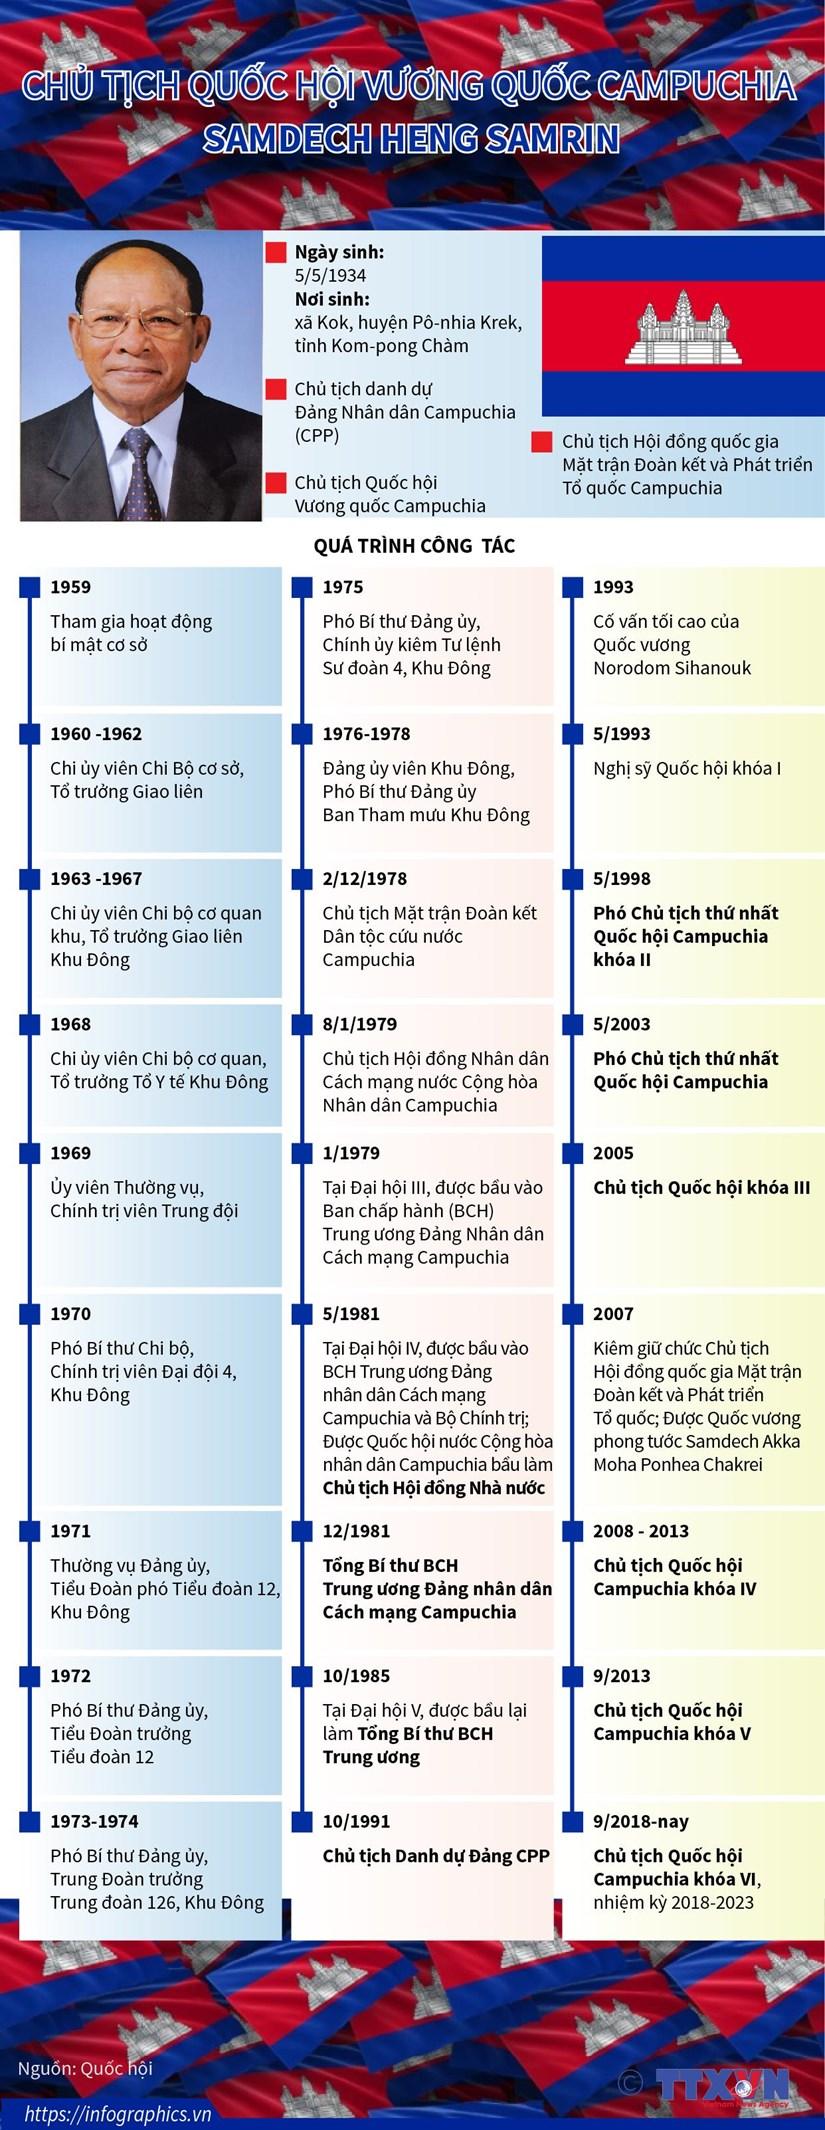 [Infographics] Chu tich Quoc hoi Campuchia Samdech Heng Samrin hinh anh 1